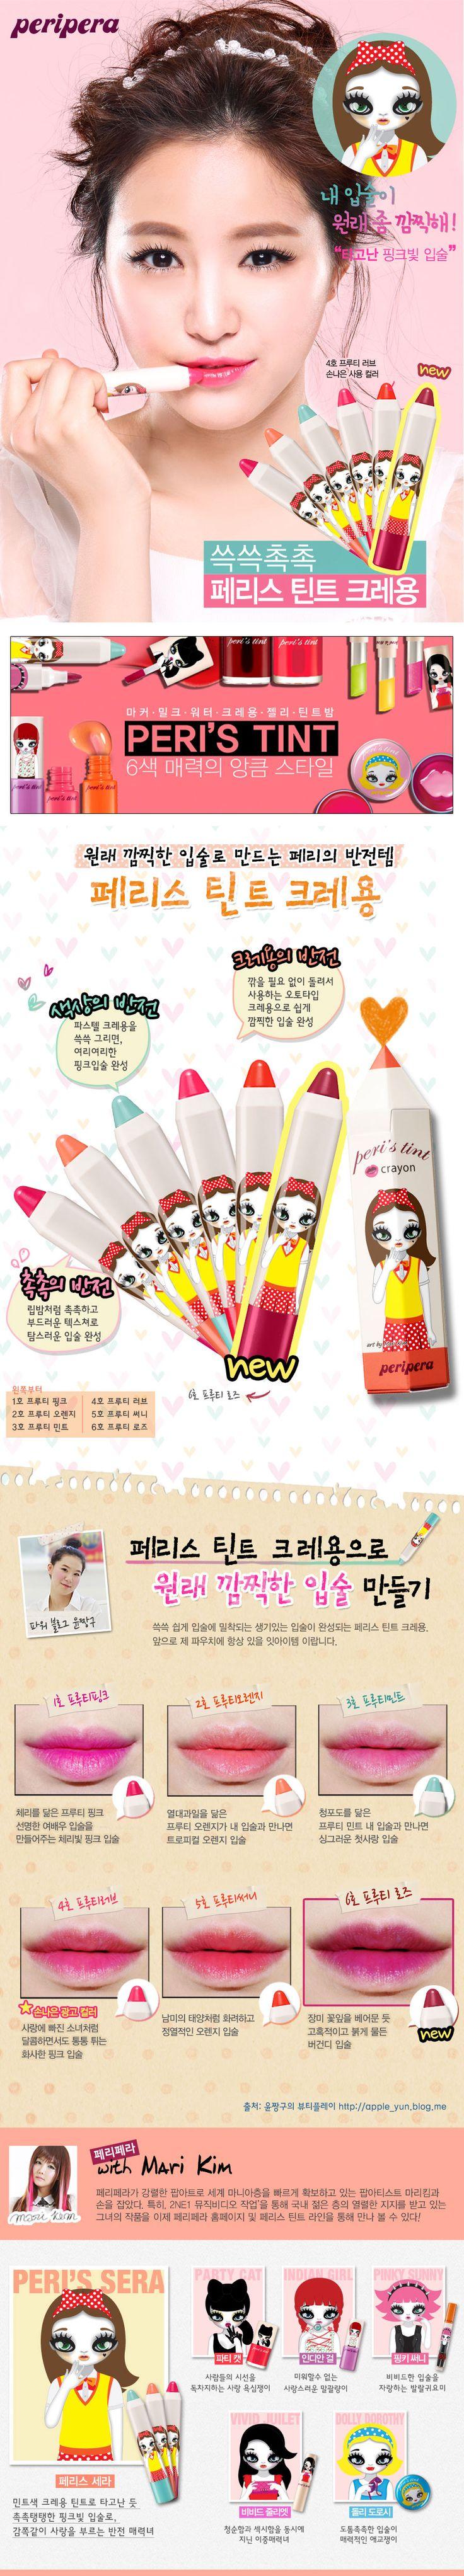 Peripera Peri's Tint Crayon Lip Tint | The Cutest Makeup